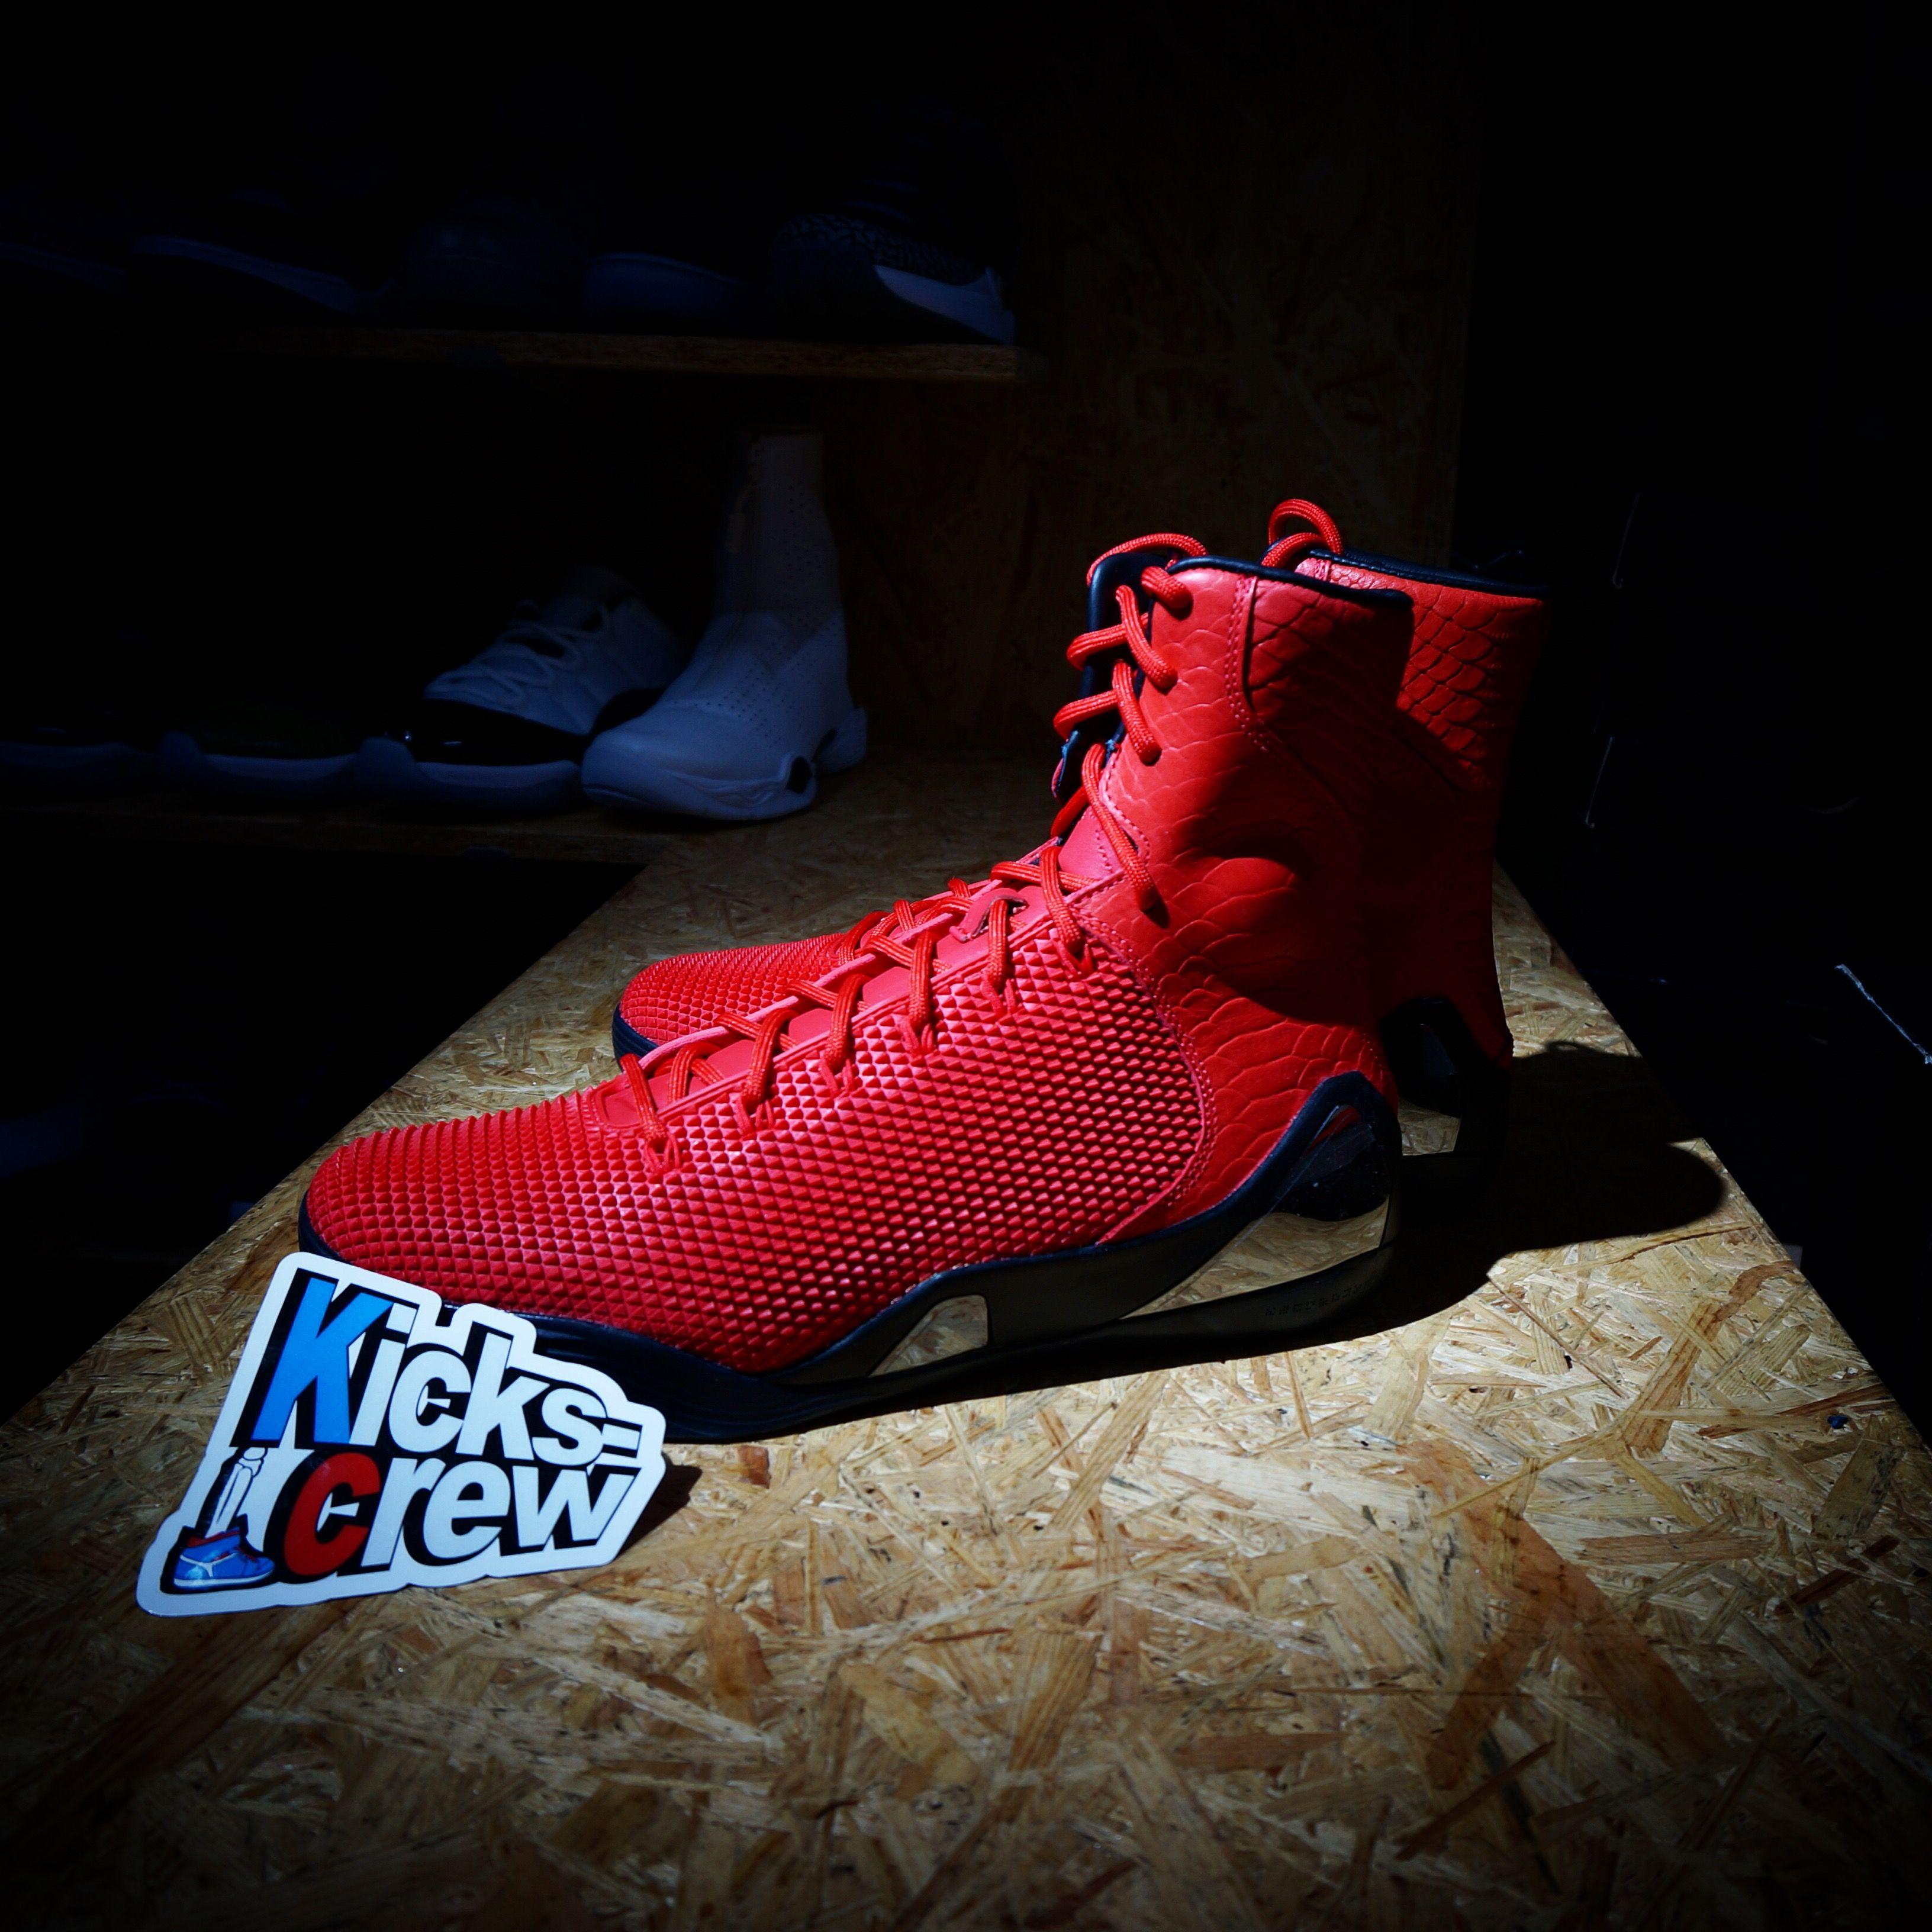 Nike Kobe 10 AS EP - All Star Game #Nike #nikebasketball #kibe #bryant  #kobeX #allstargame | Just Do It! | Pinterest | Kibe bryant